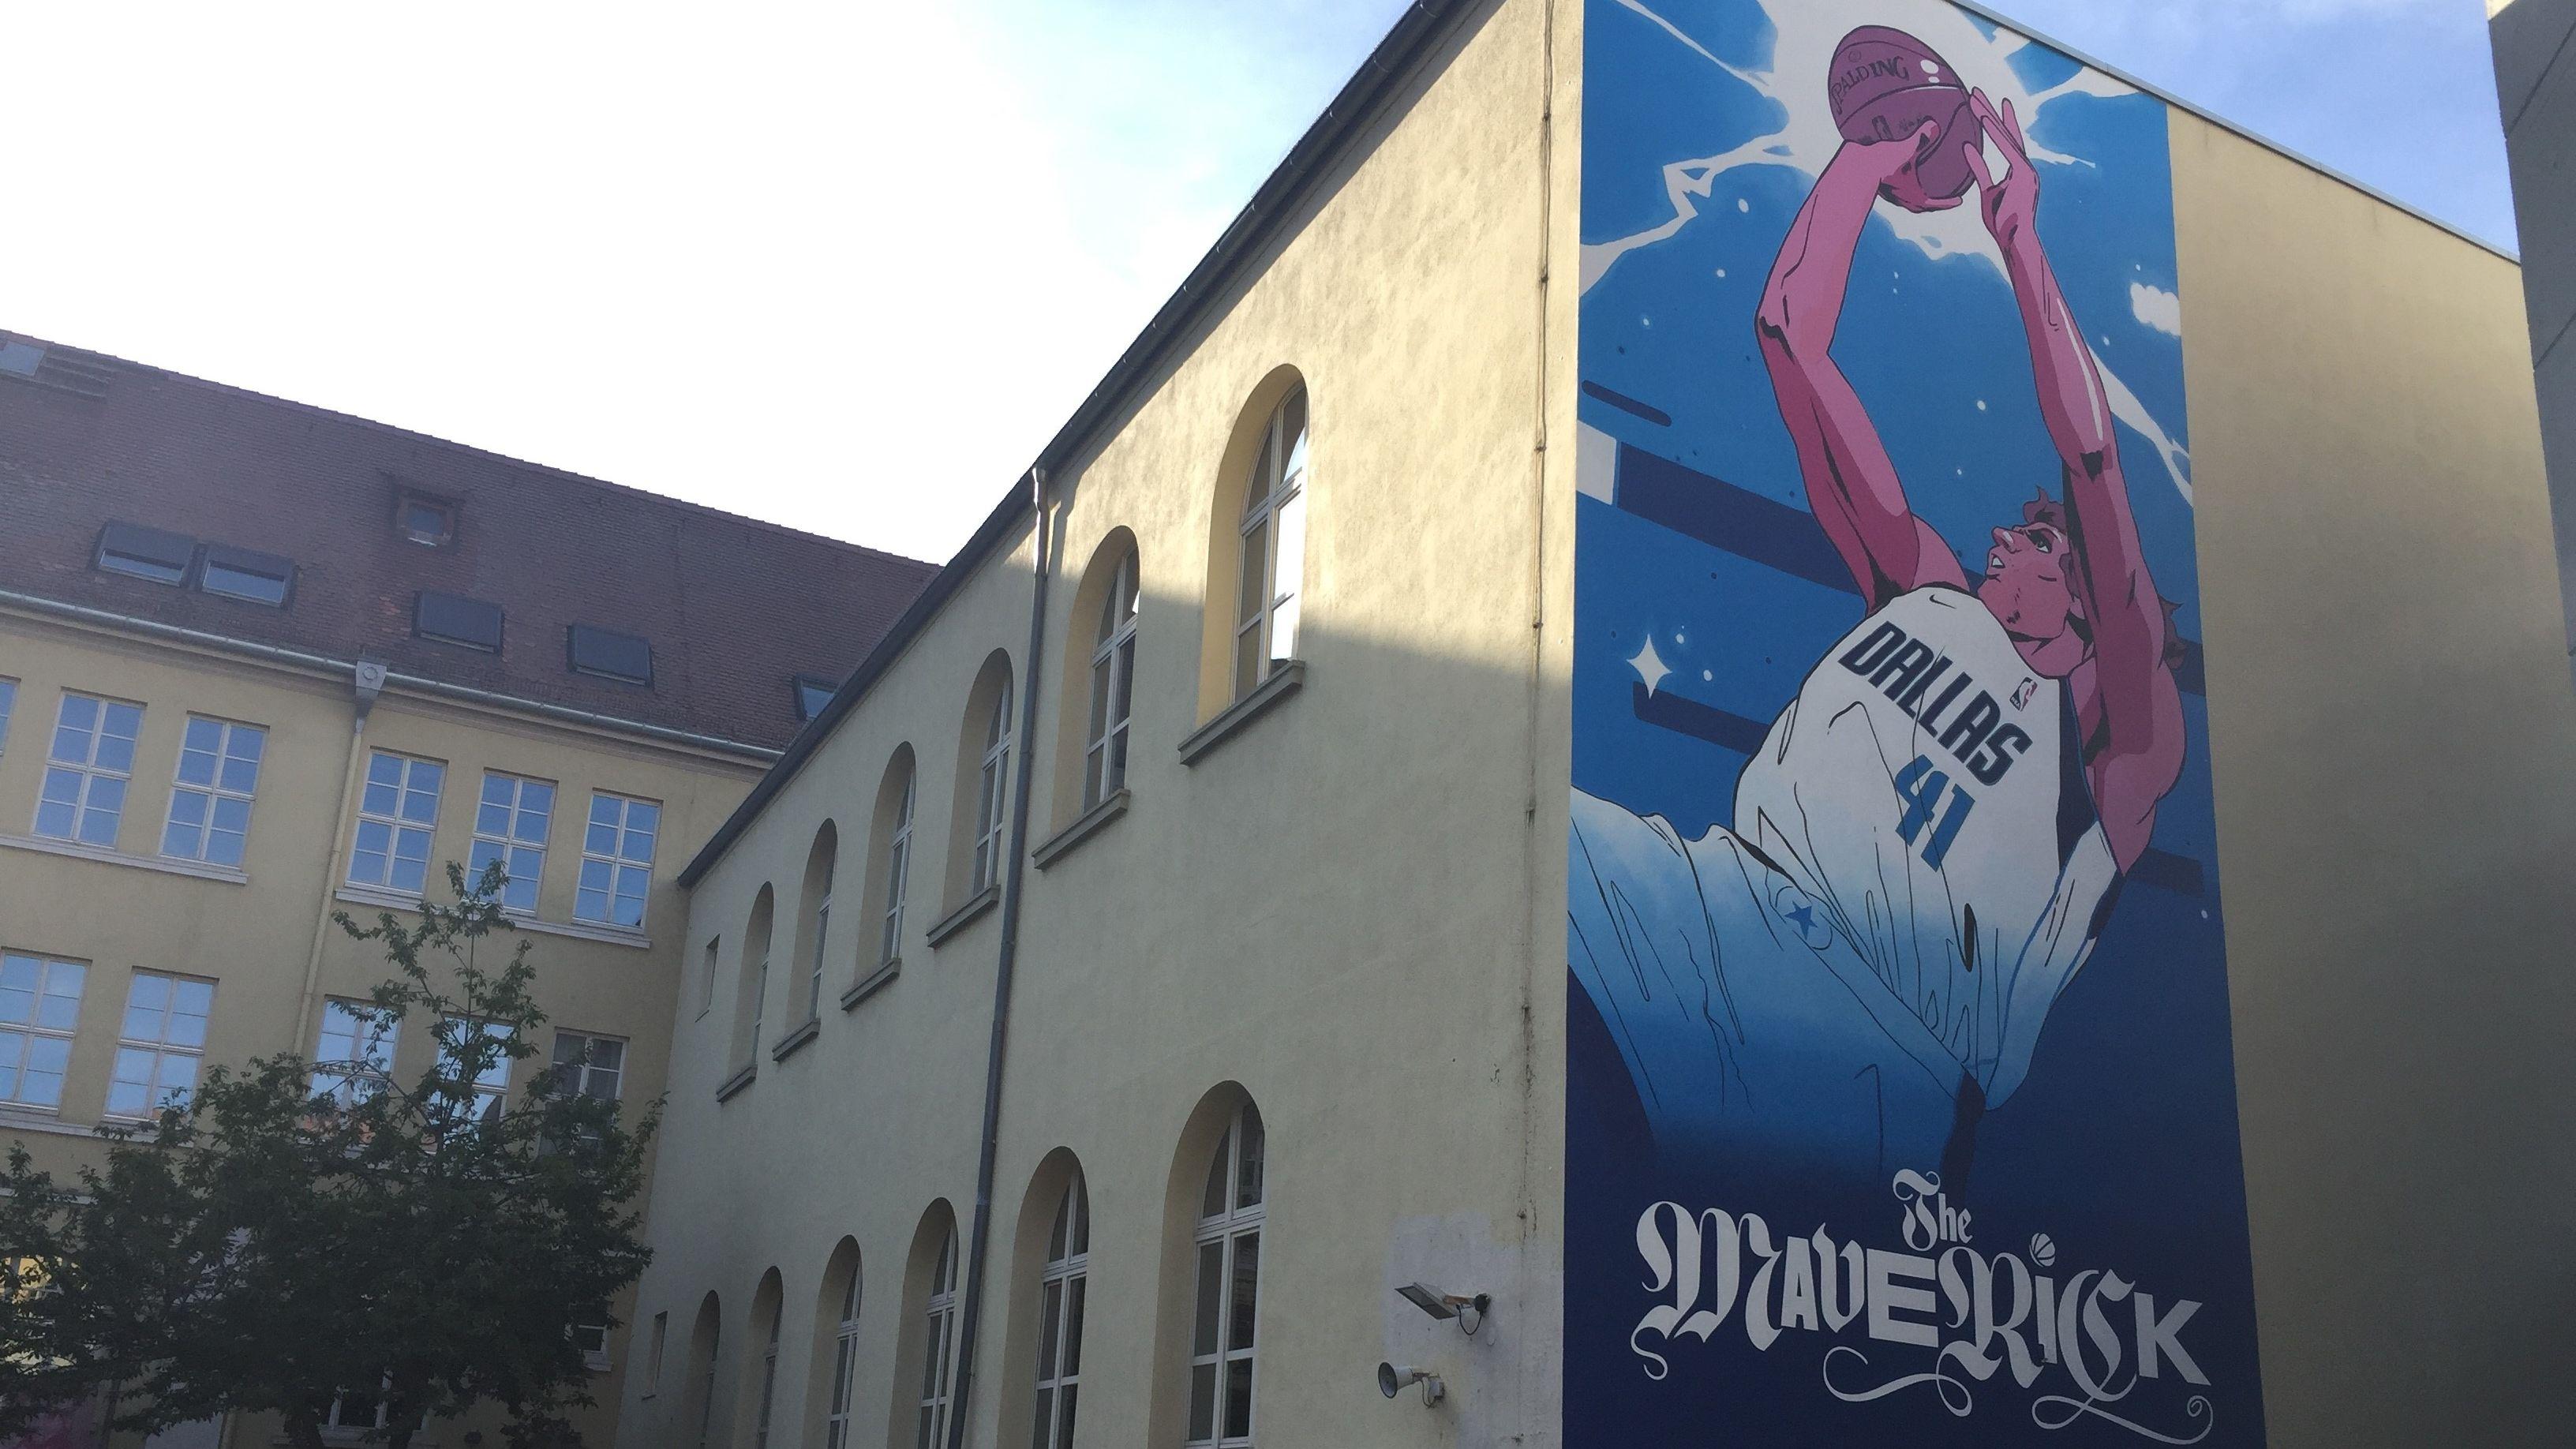 Dirk-Nowitzki-Wandbild (Röntgen-Gymnasium)